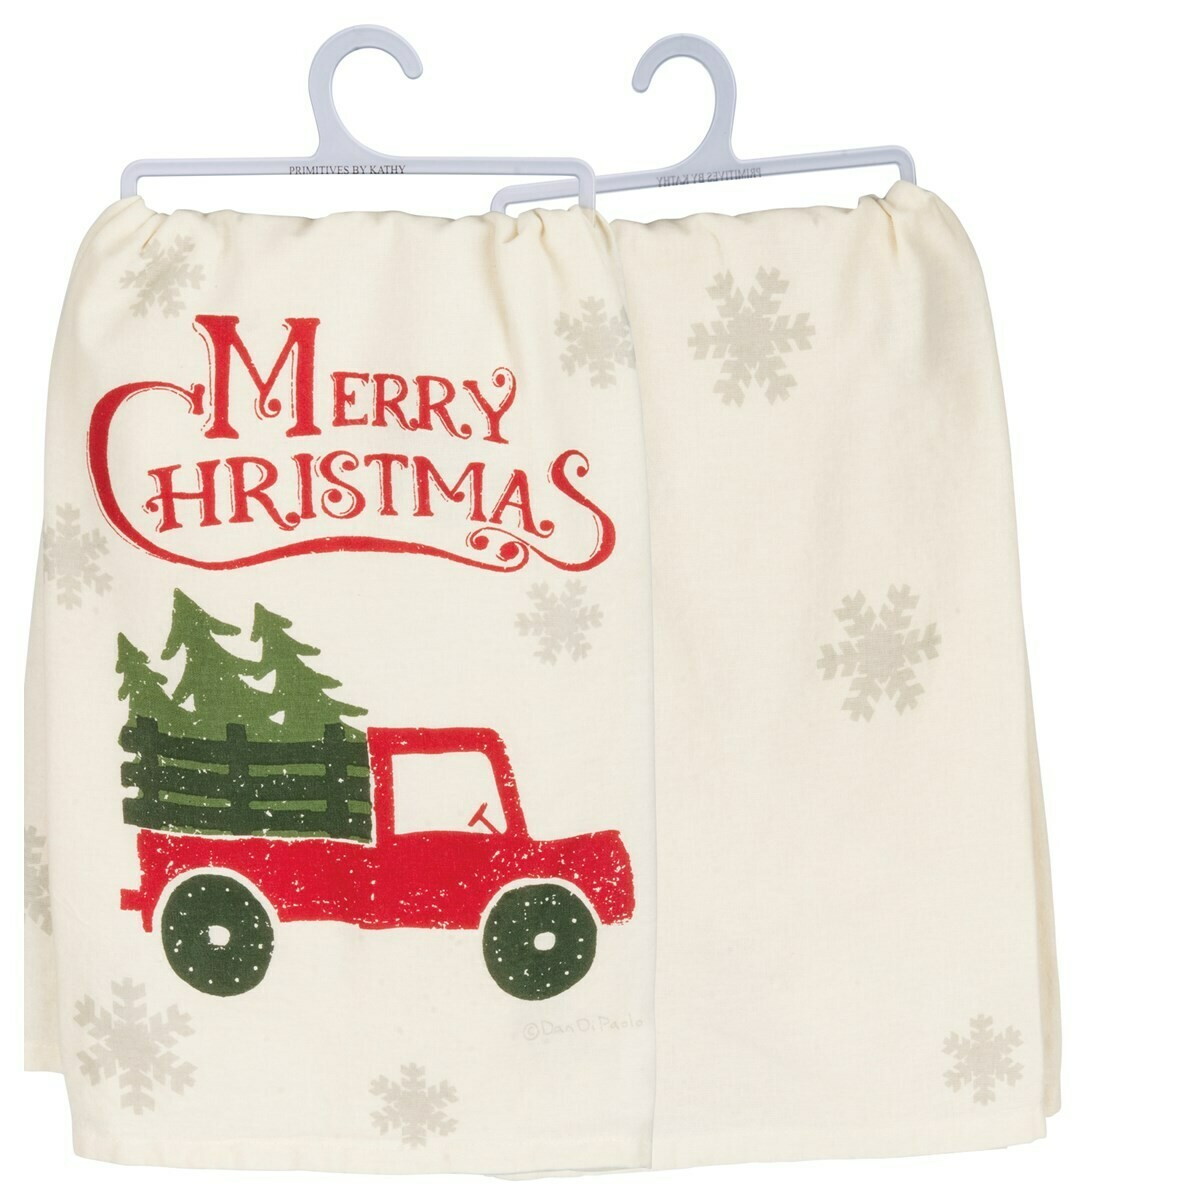 Merry Christmas Truck Towel